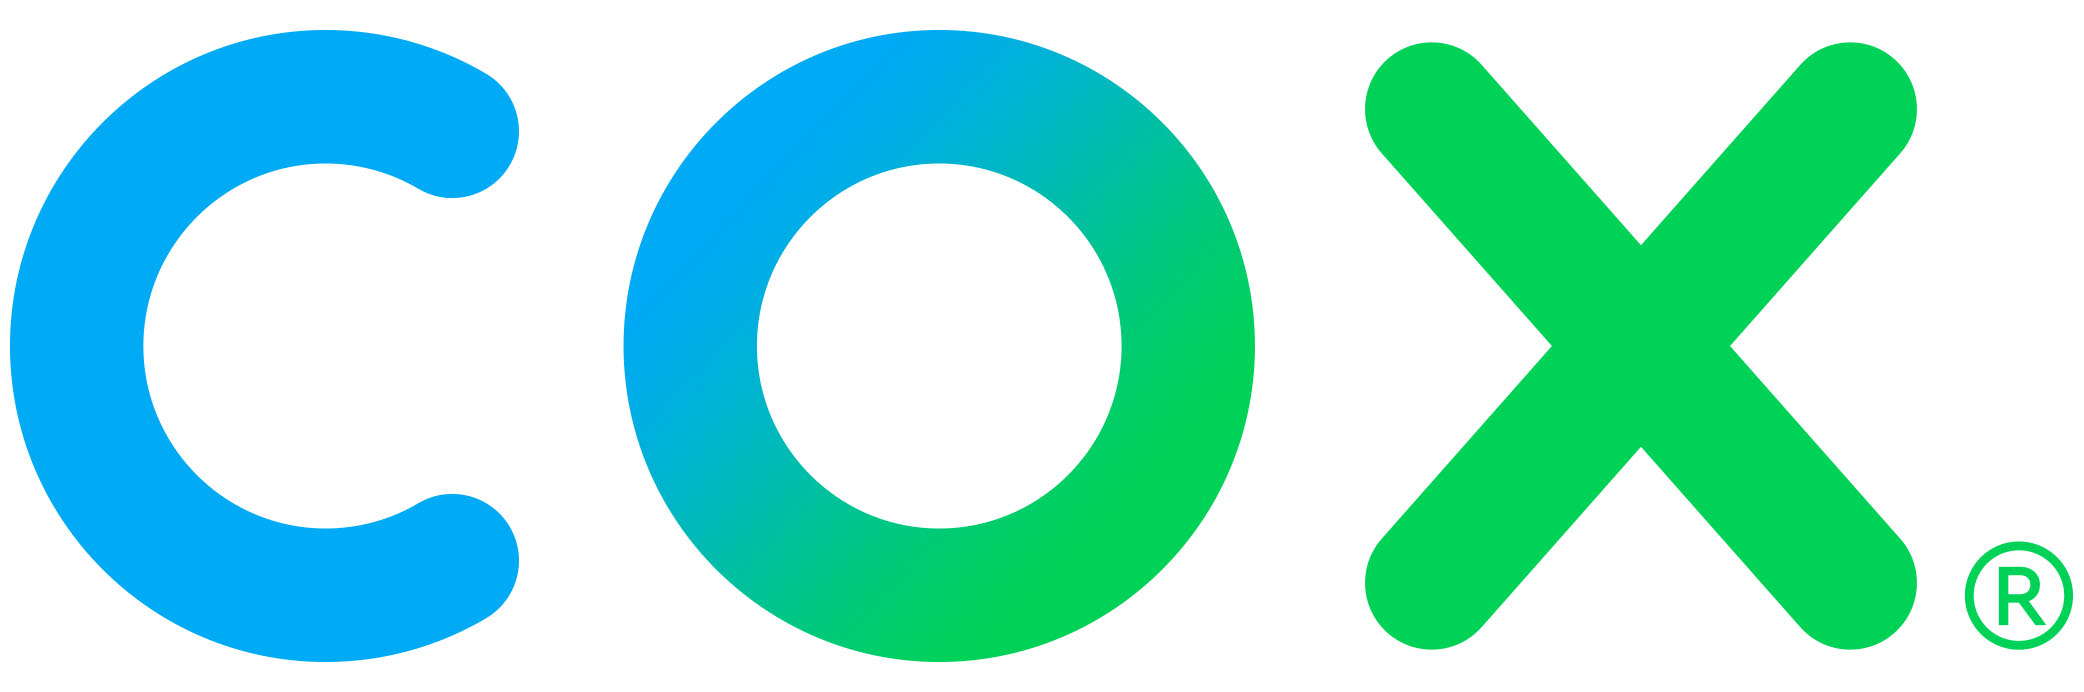 Cox Logo 4C (R).jpg